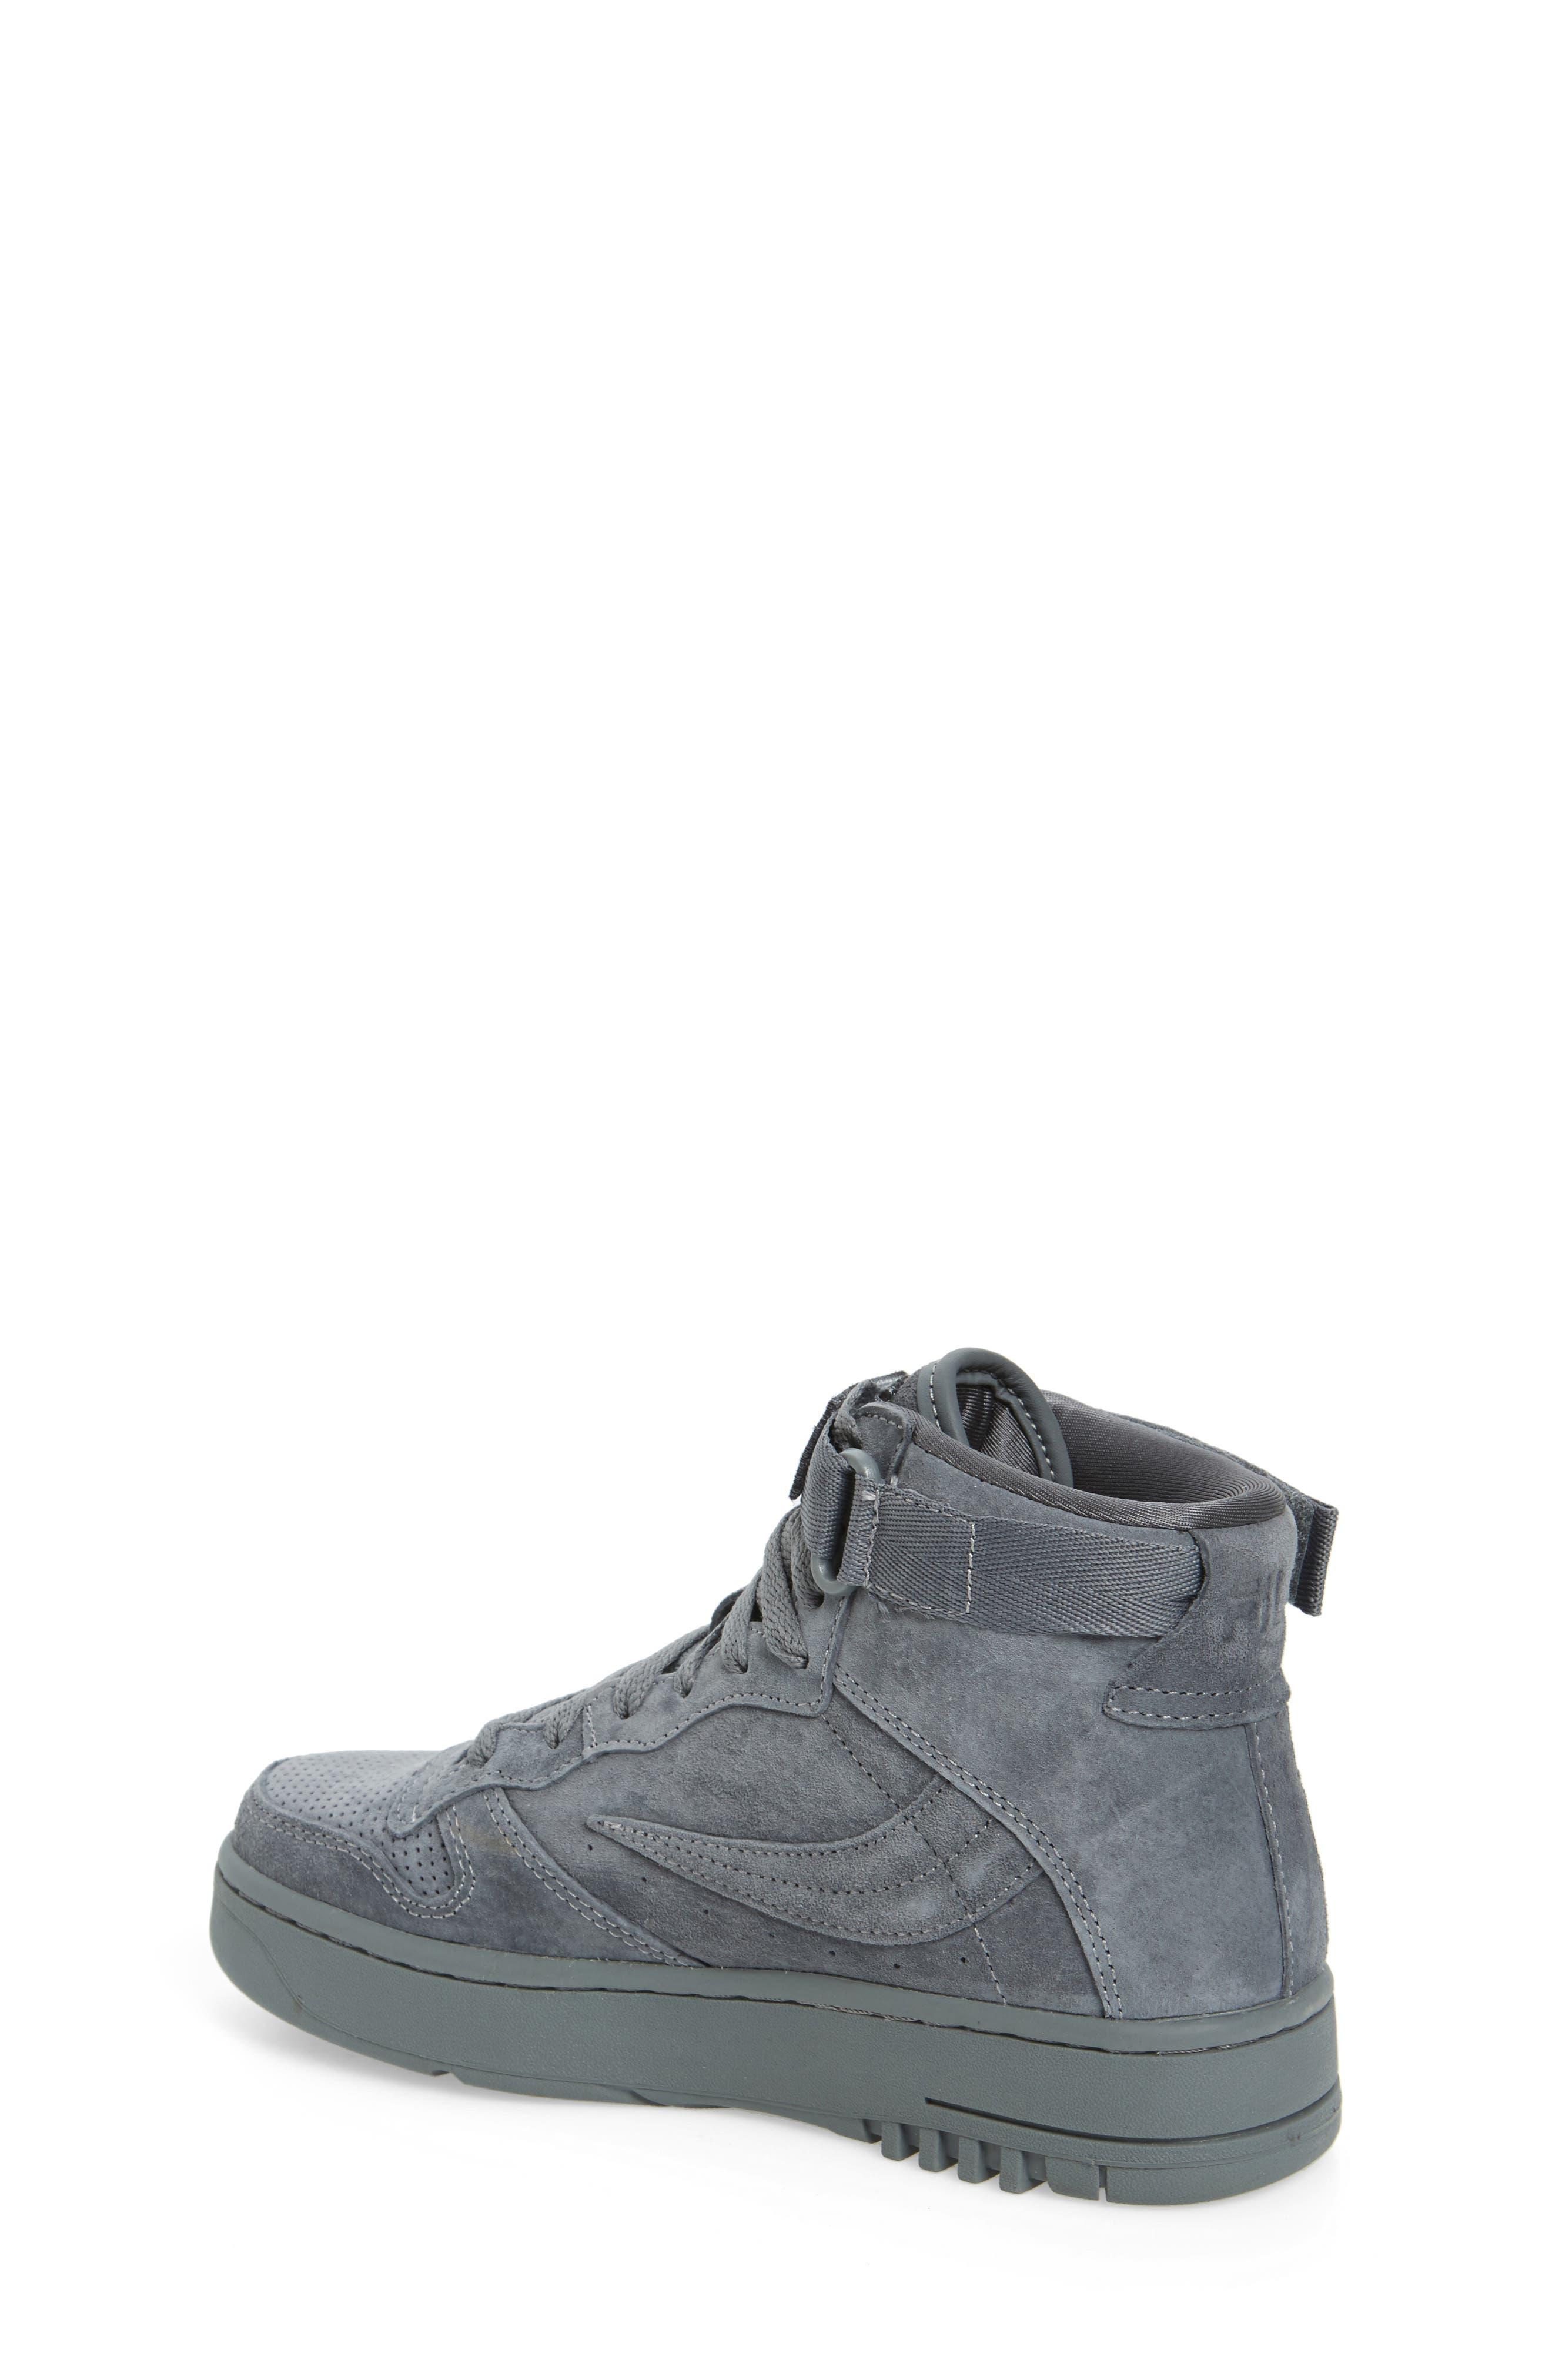 USA FX-100 High Top Sneaker,                             Alternate thumbnail 2, color,                             050